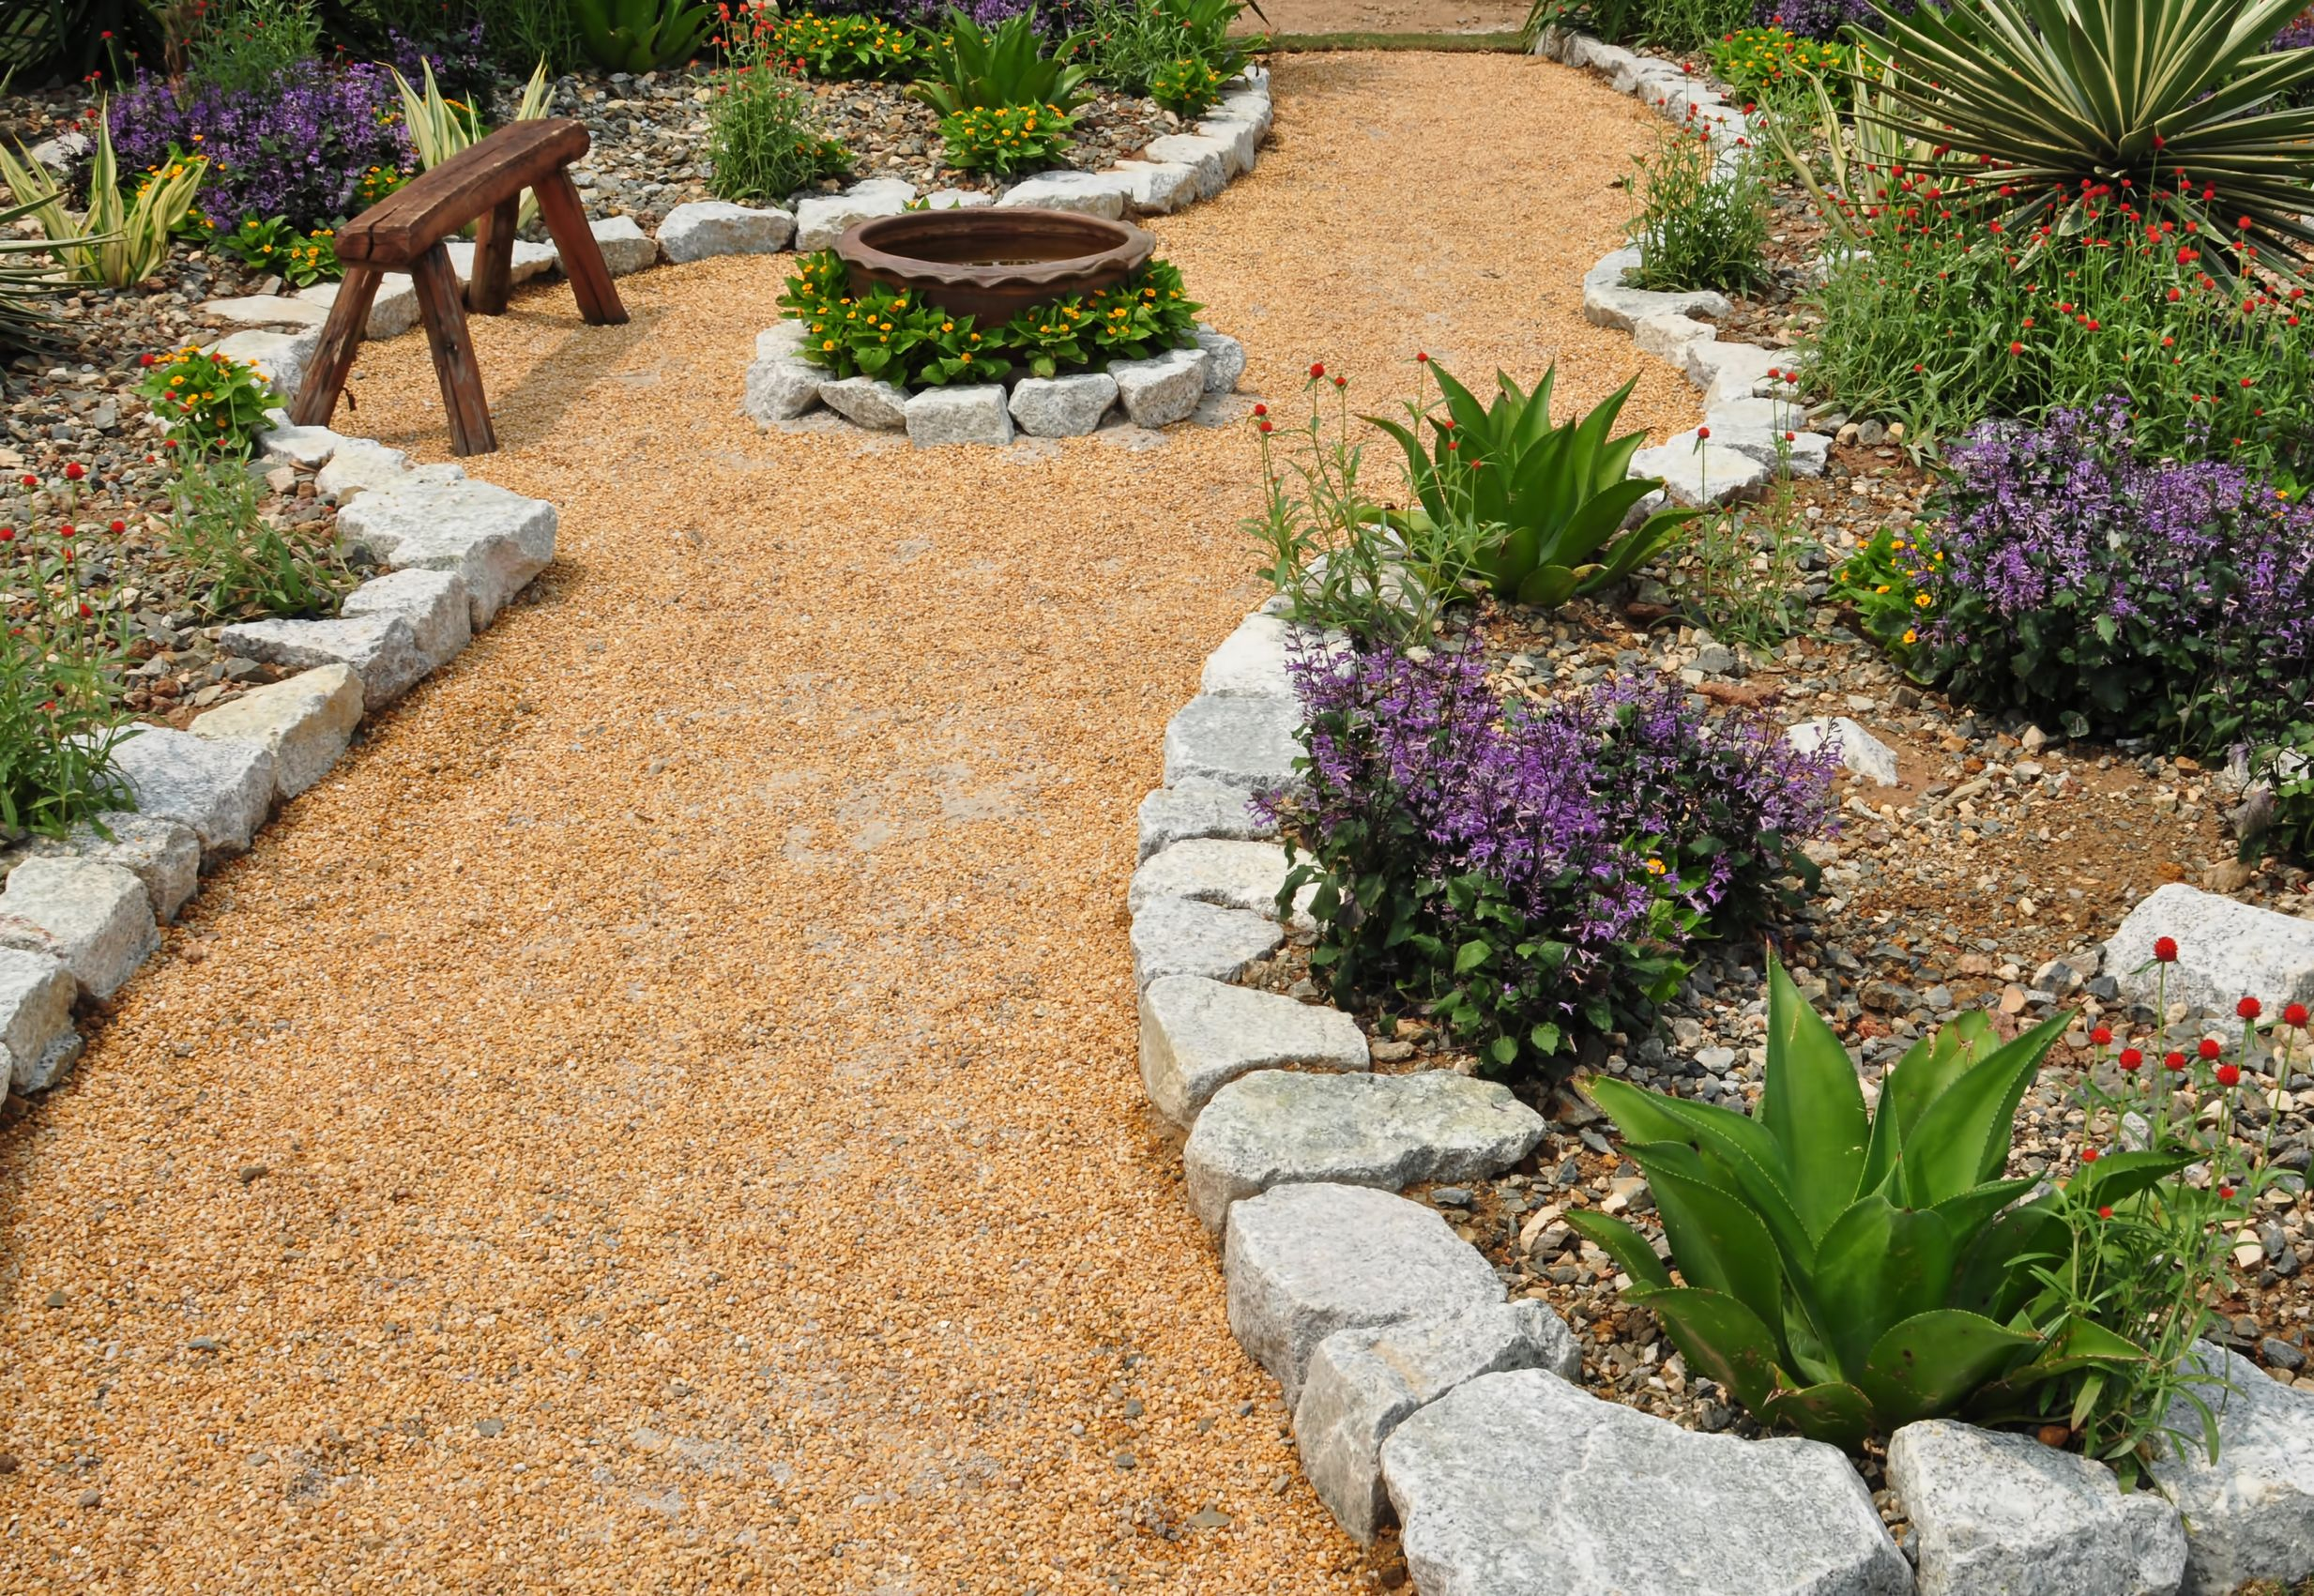 Backyard Landscaping On Hills | Joy Studio Design Gallery ... on Xeriscape Backyard Designs id=85364